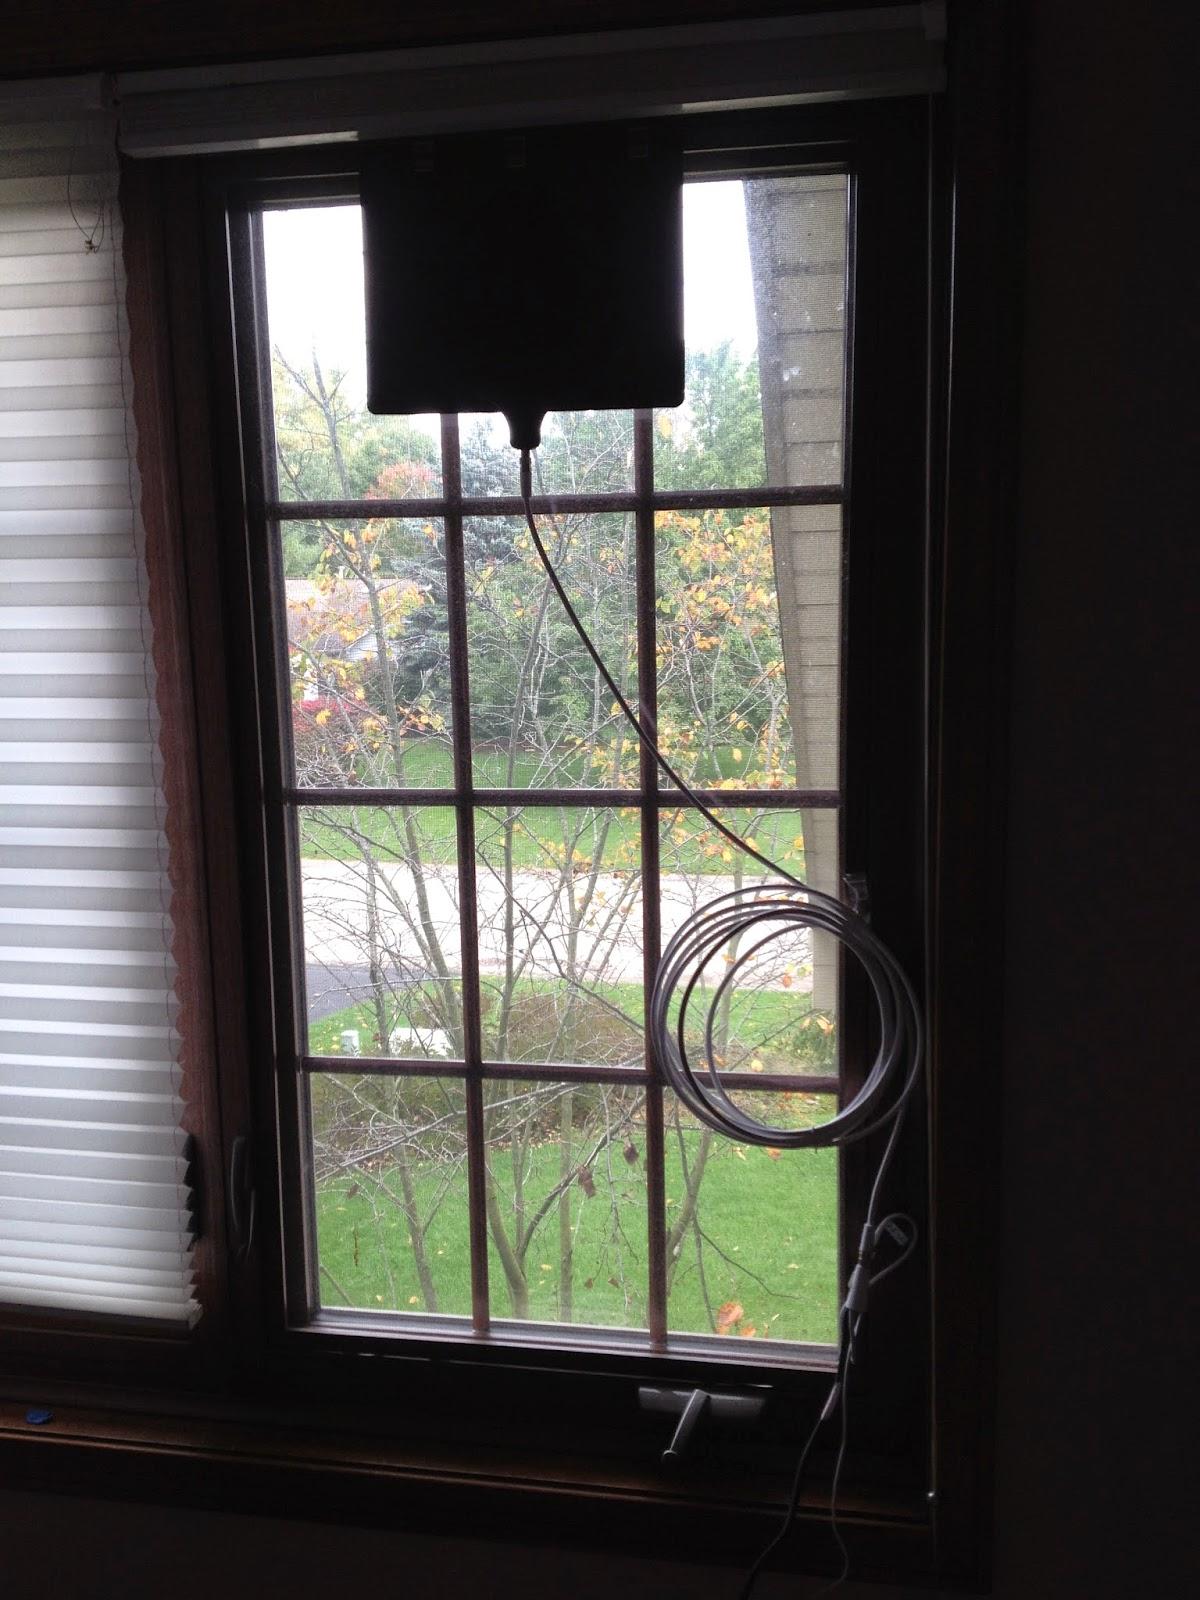 Clarence Oddbody: My new Mohu Leaf digital TV antenna works great